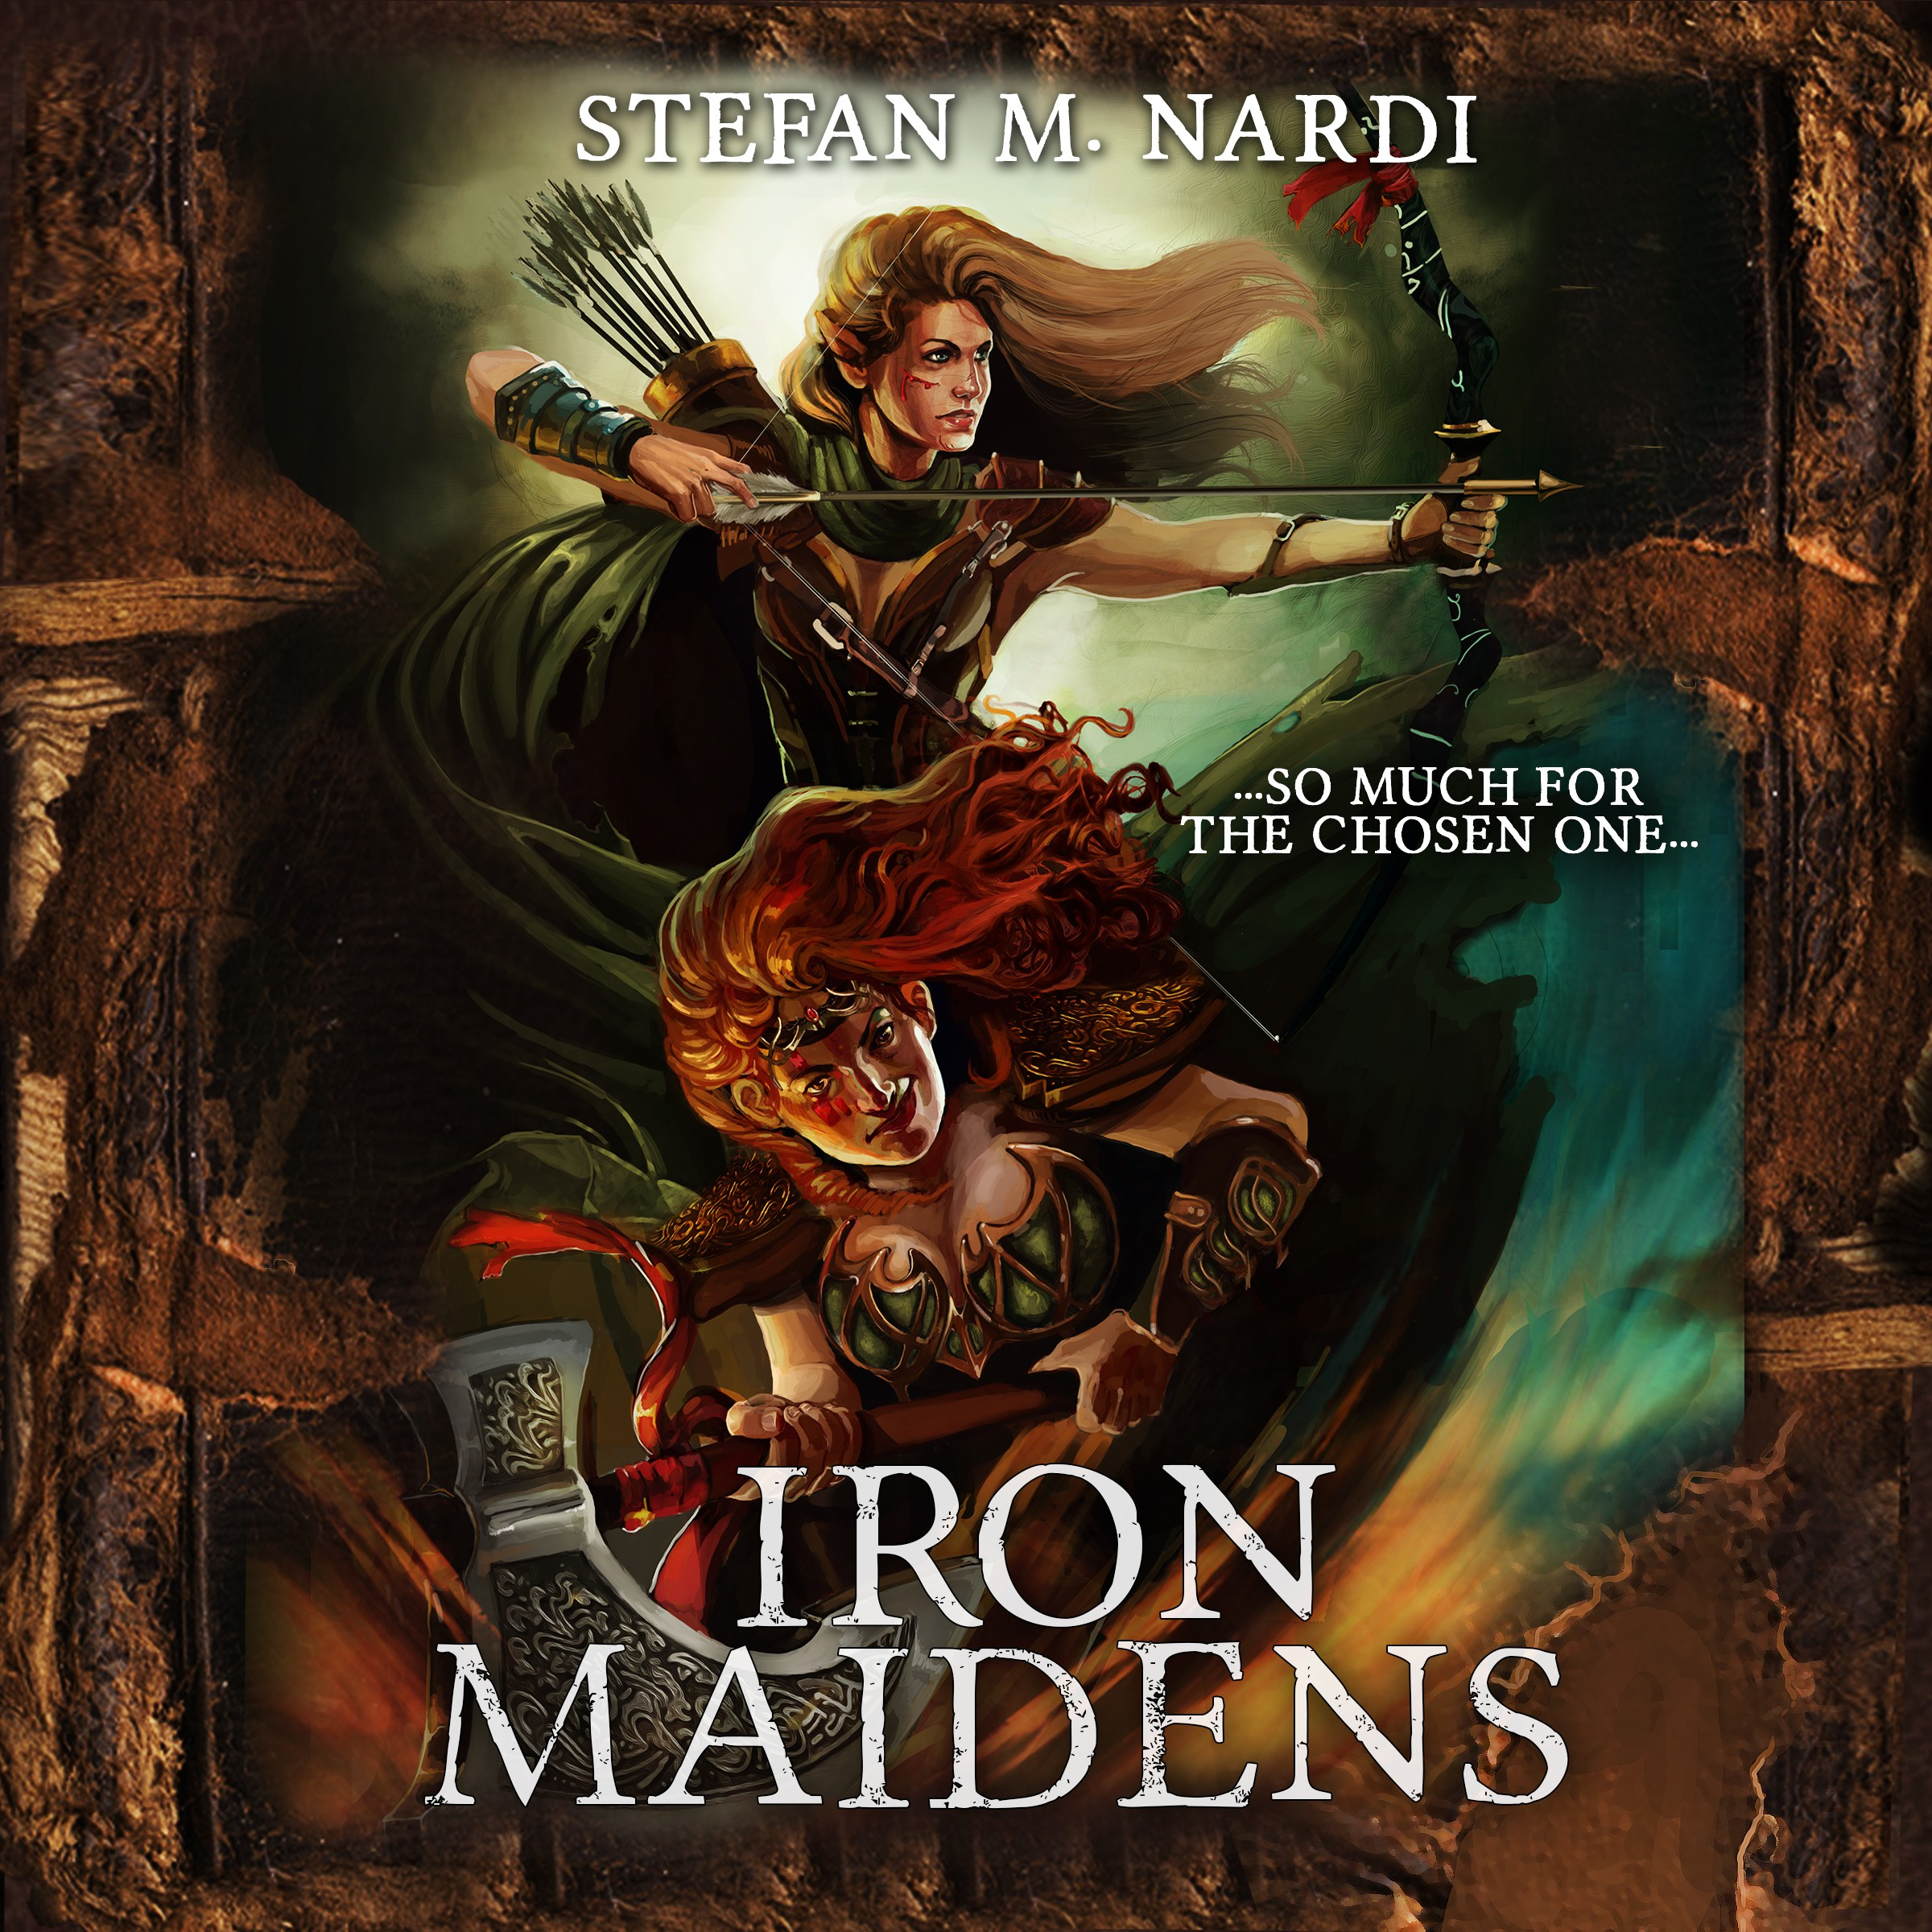 Iron Maidens - Epic Fantasy Book Cover